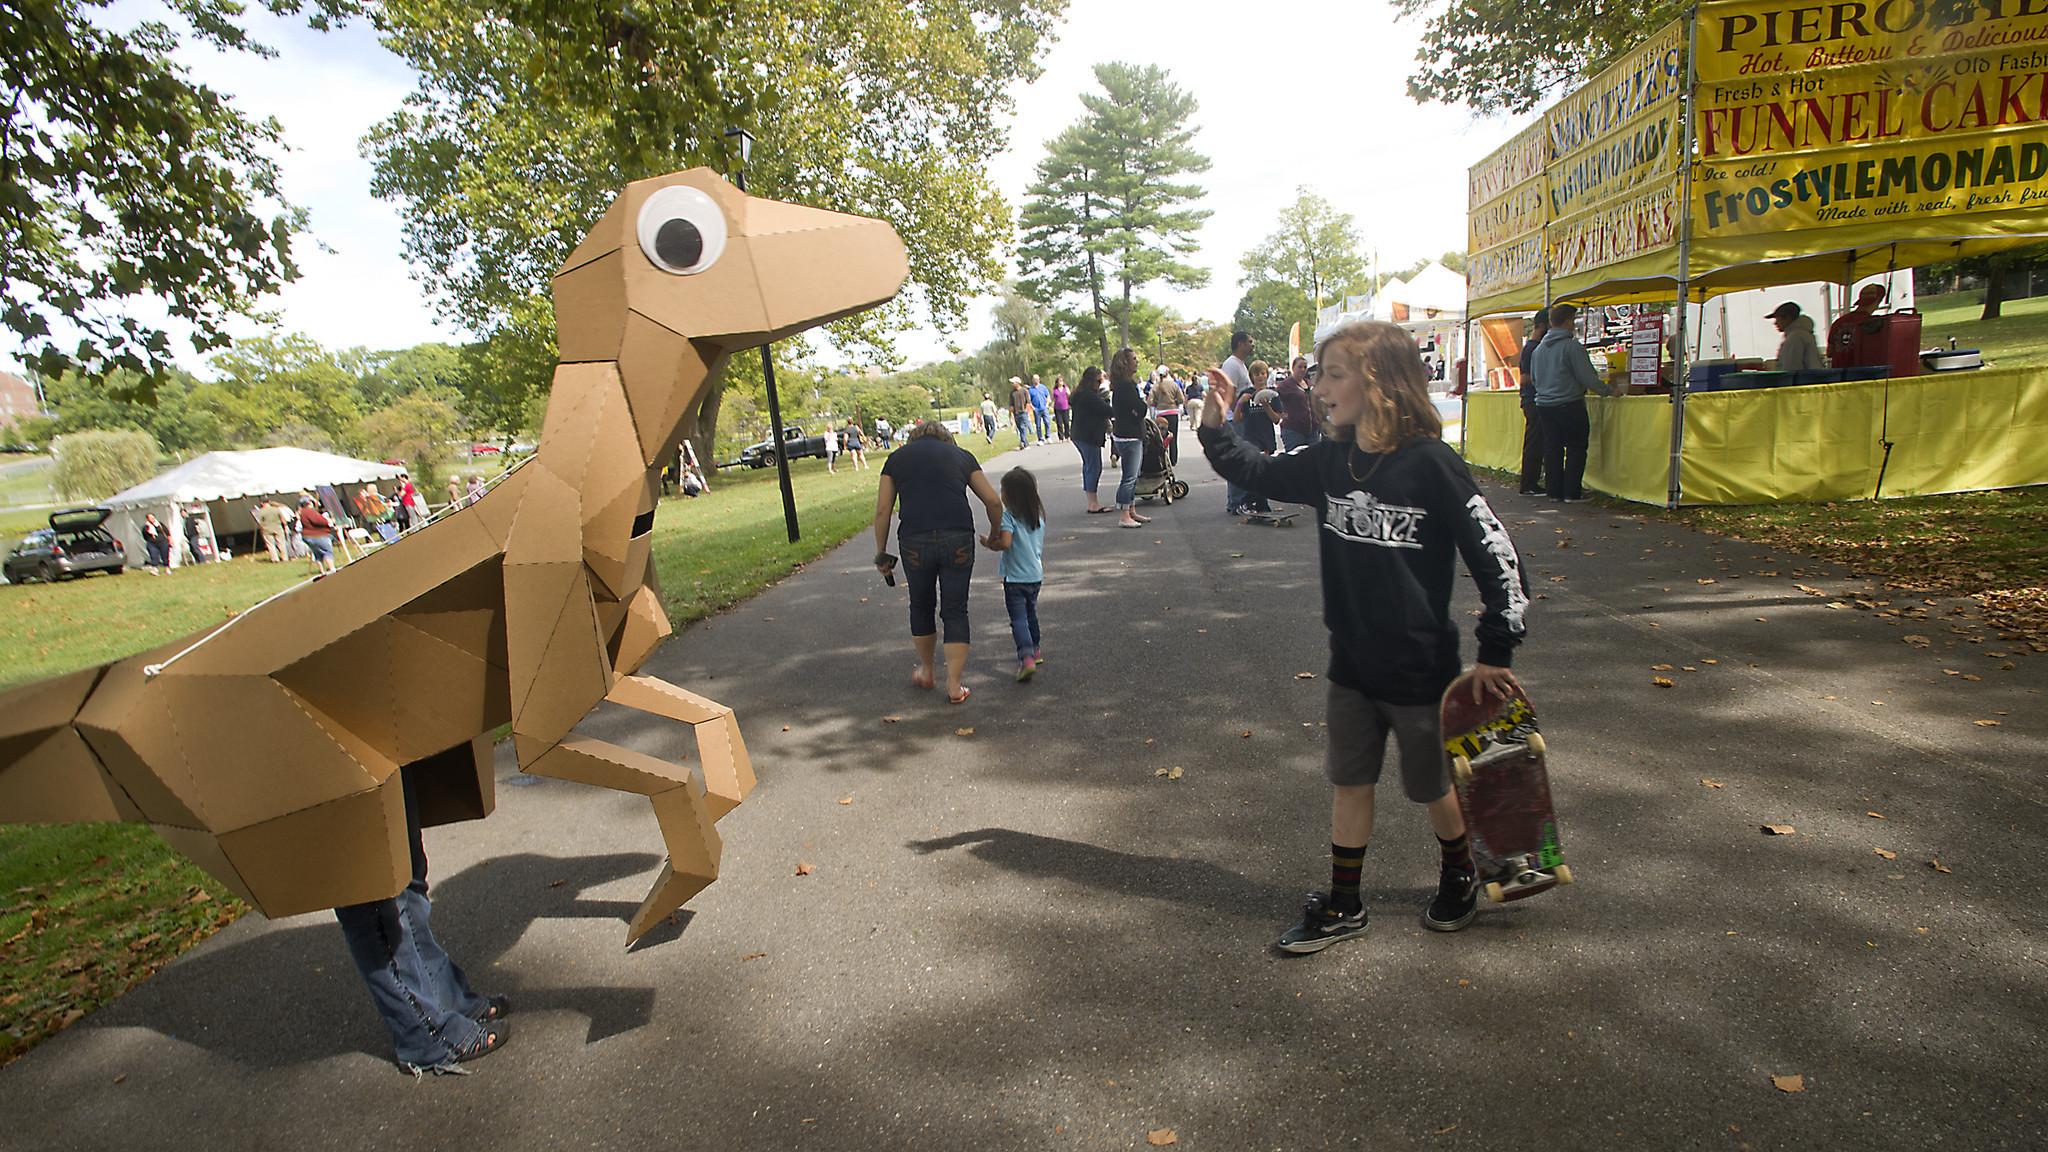 mc-pictures-first-annual-allentown-artsfest-20-004.jpg